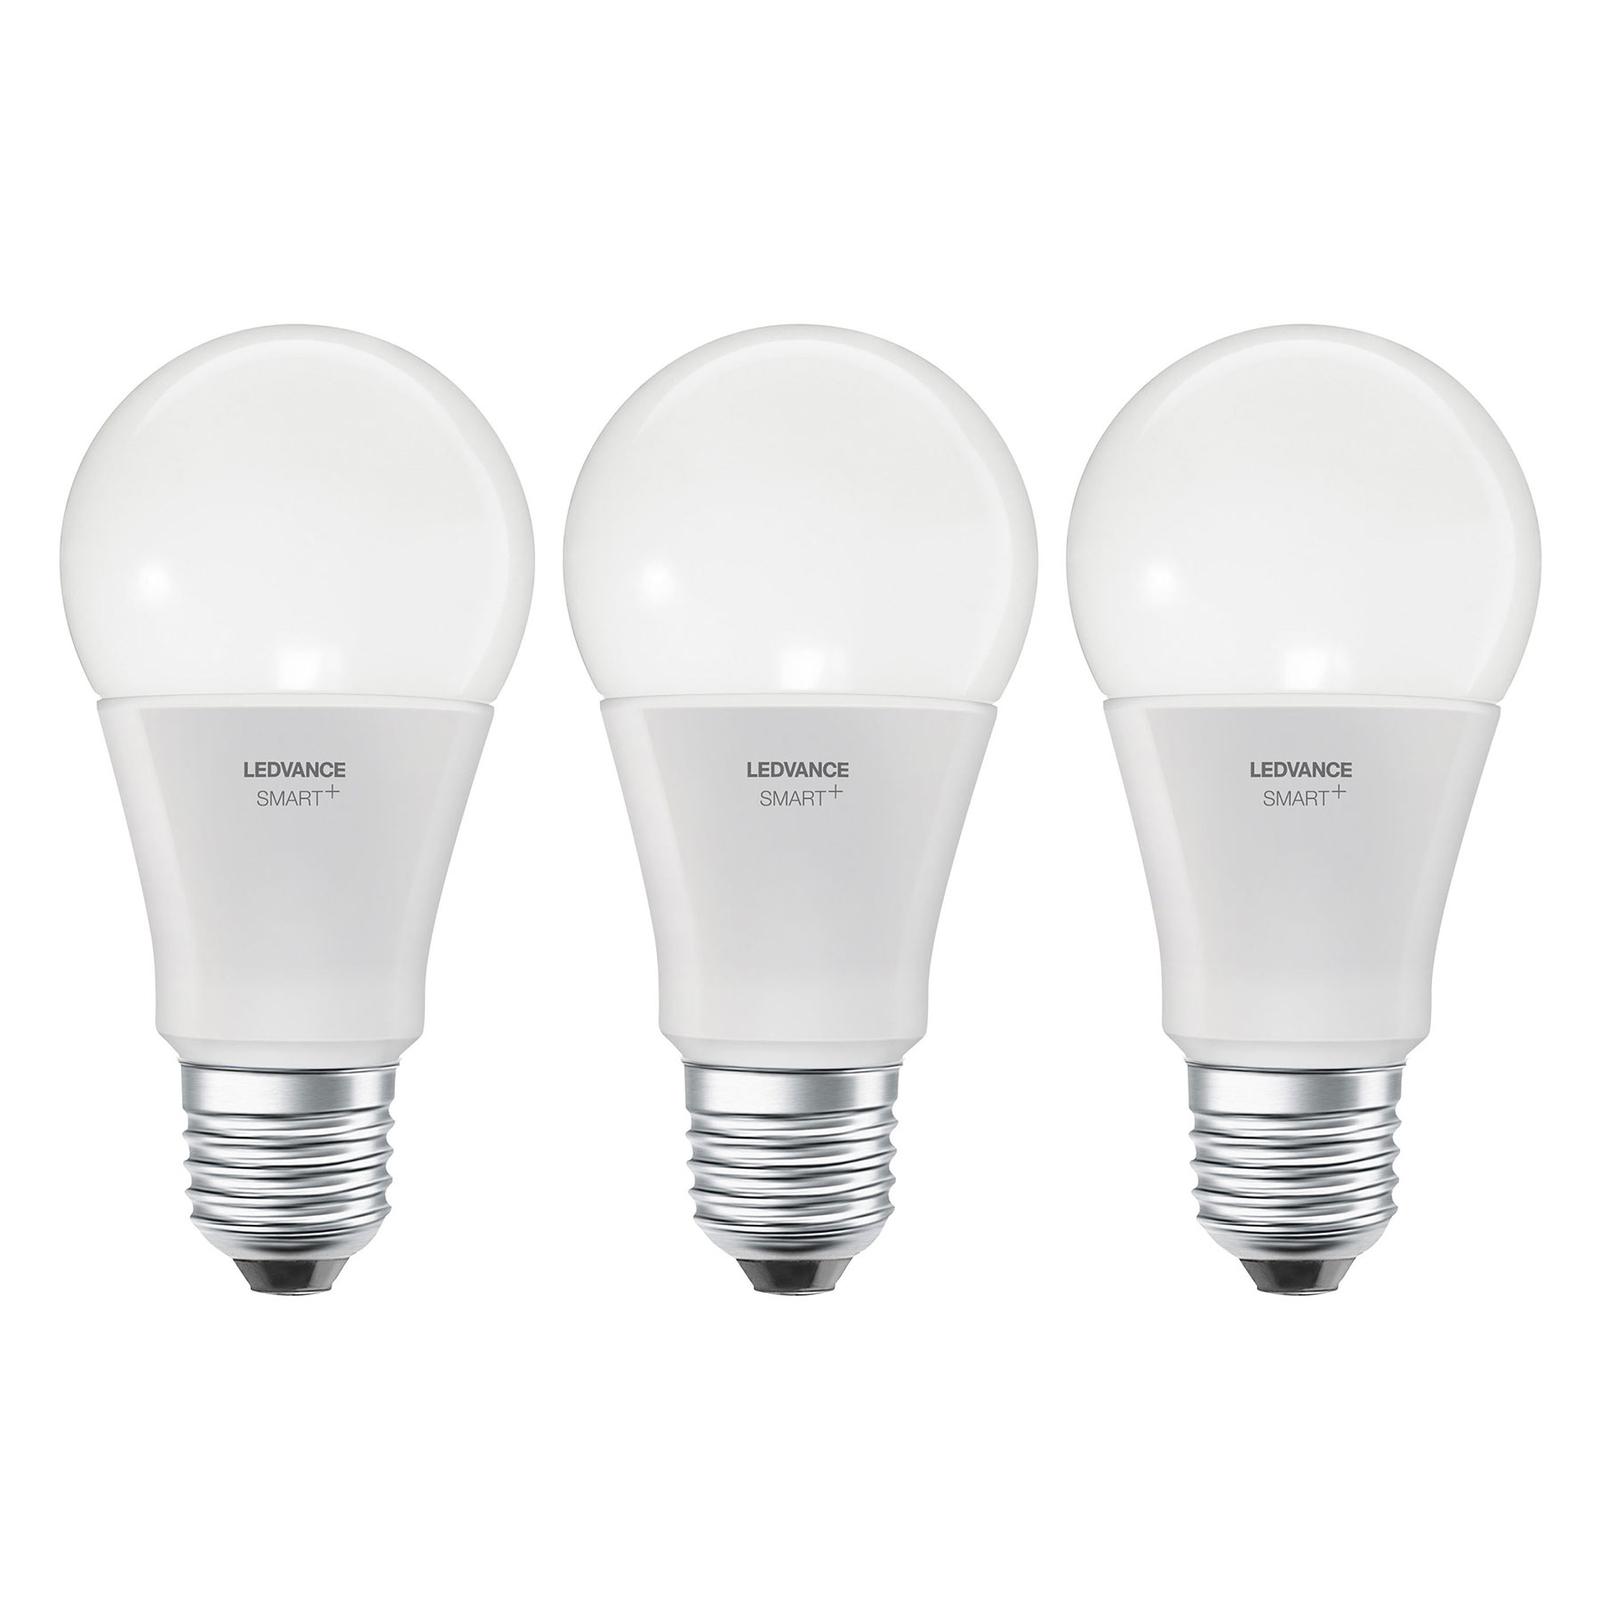 LEDVANCE SMART+ WiFi E27 14W Classic CCT 3szt.